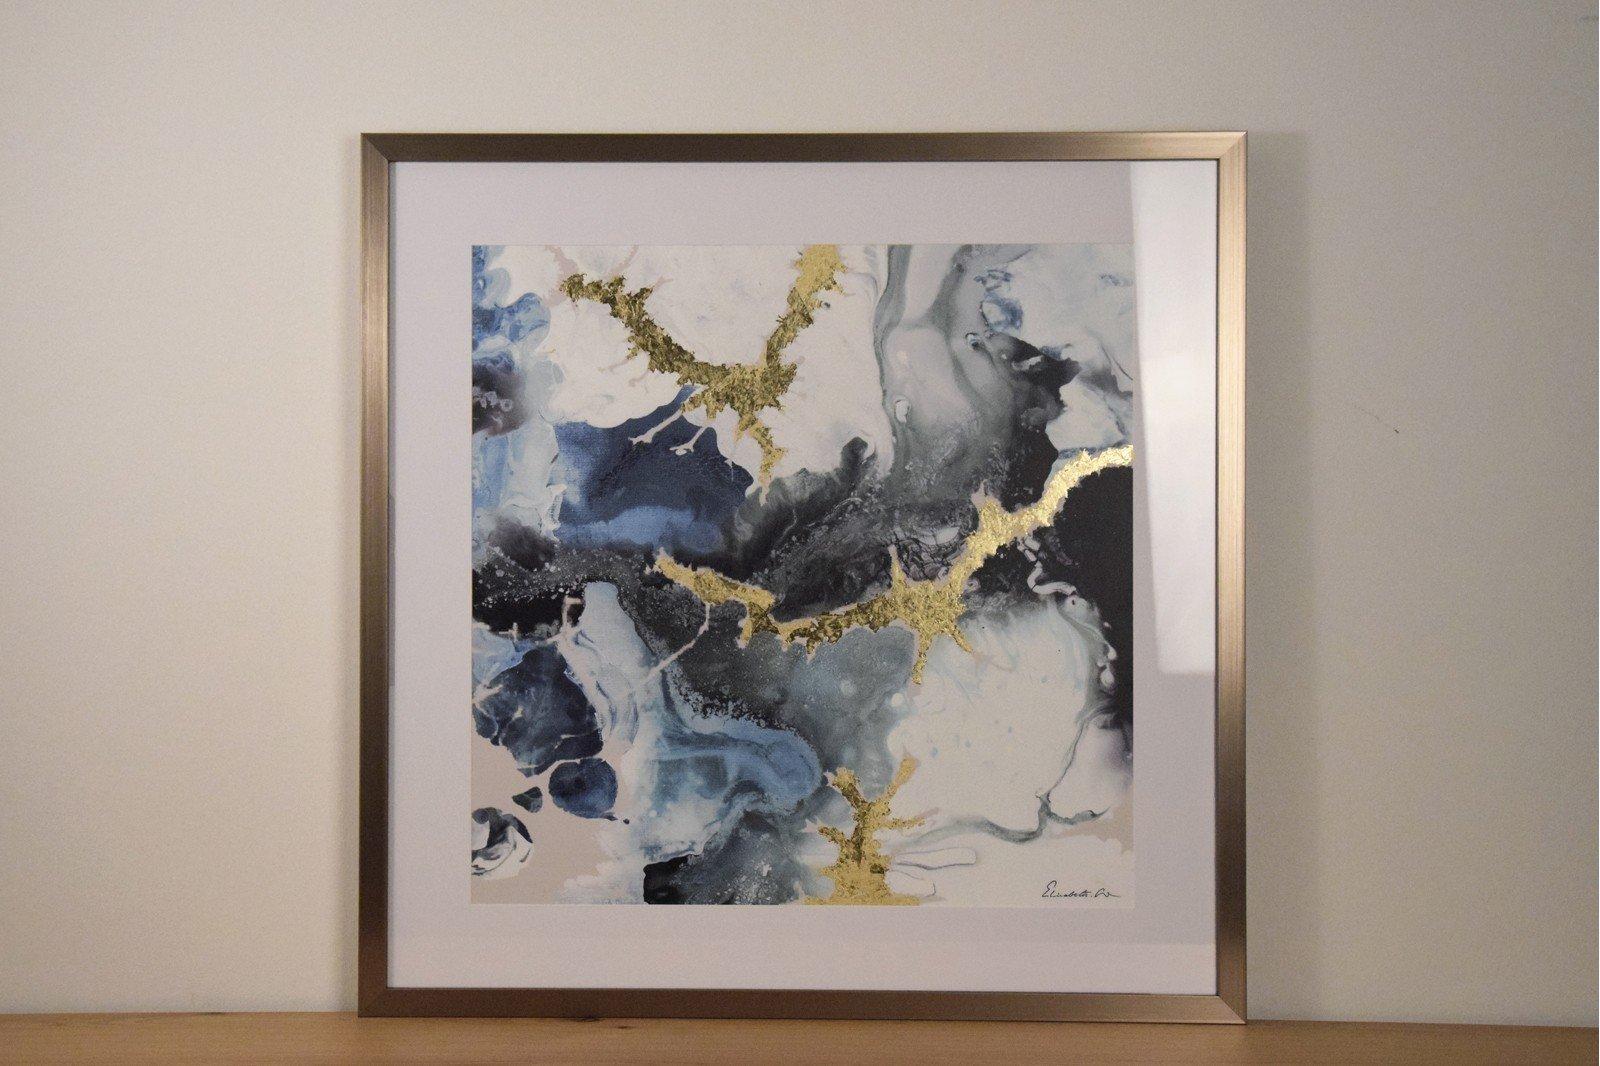 pintura-abstracta-enmarcada-con-cristal.jpg